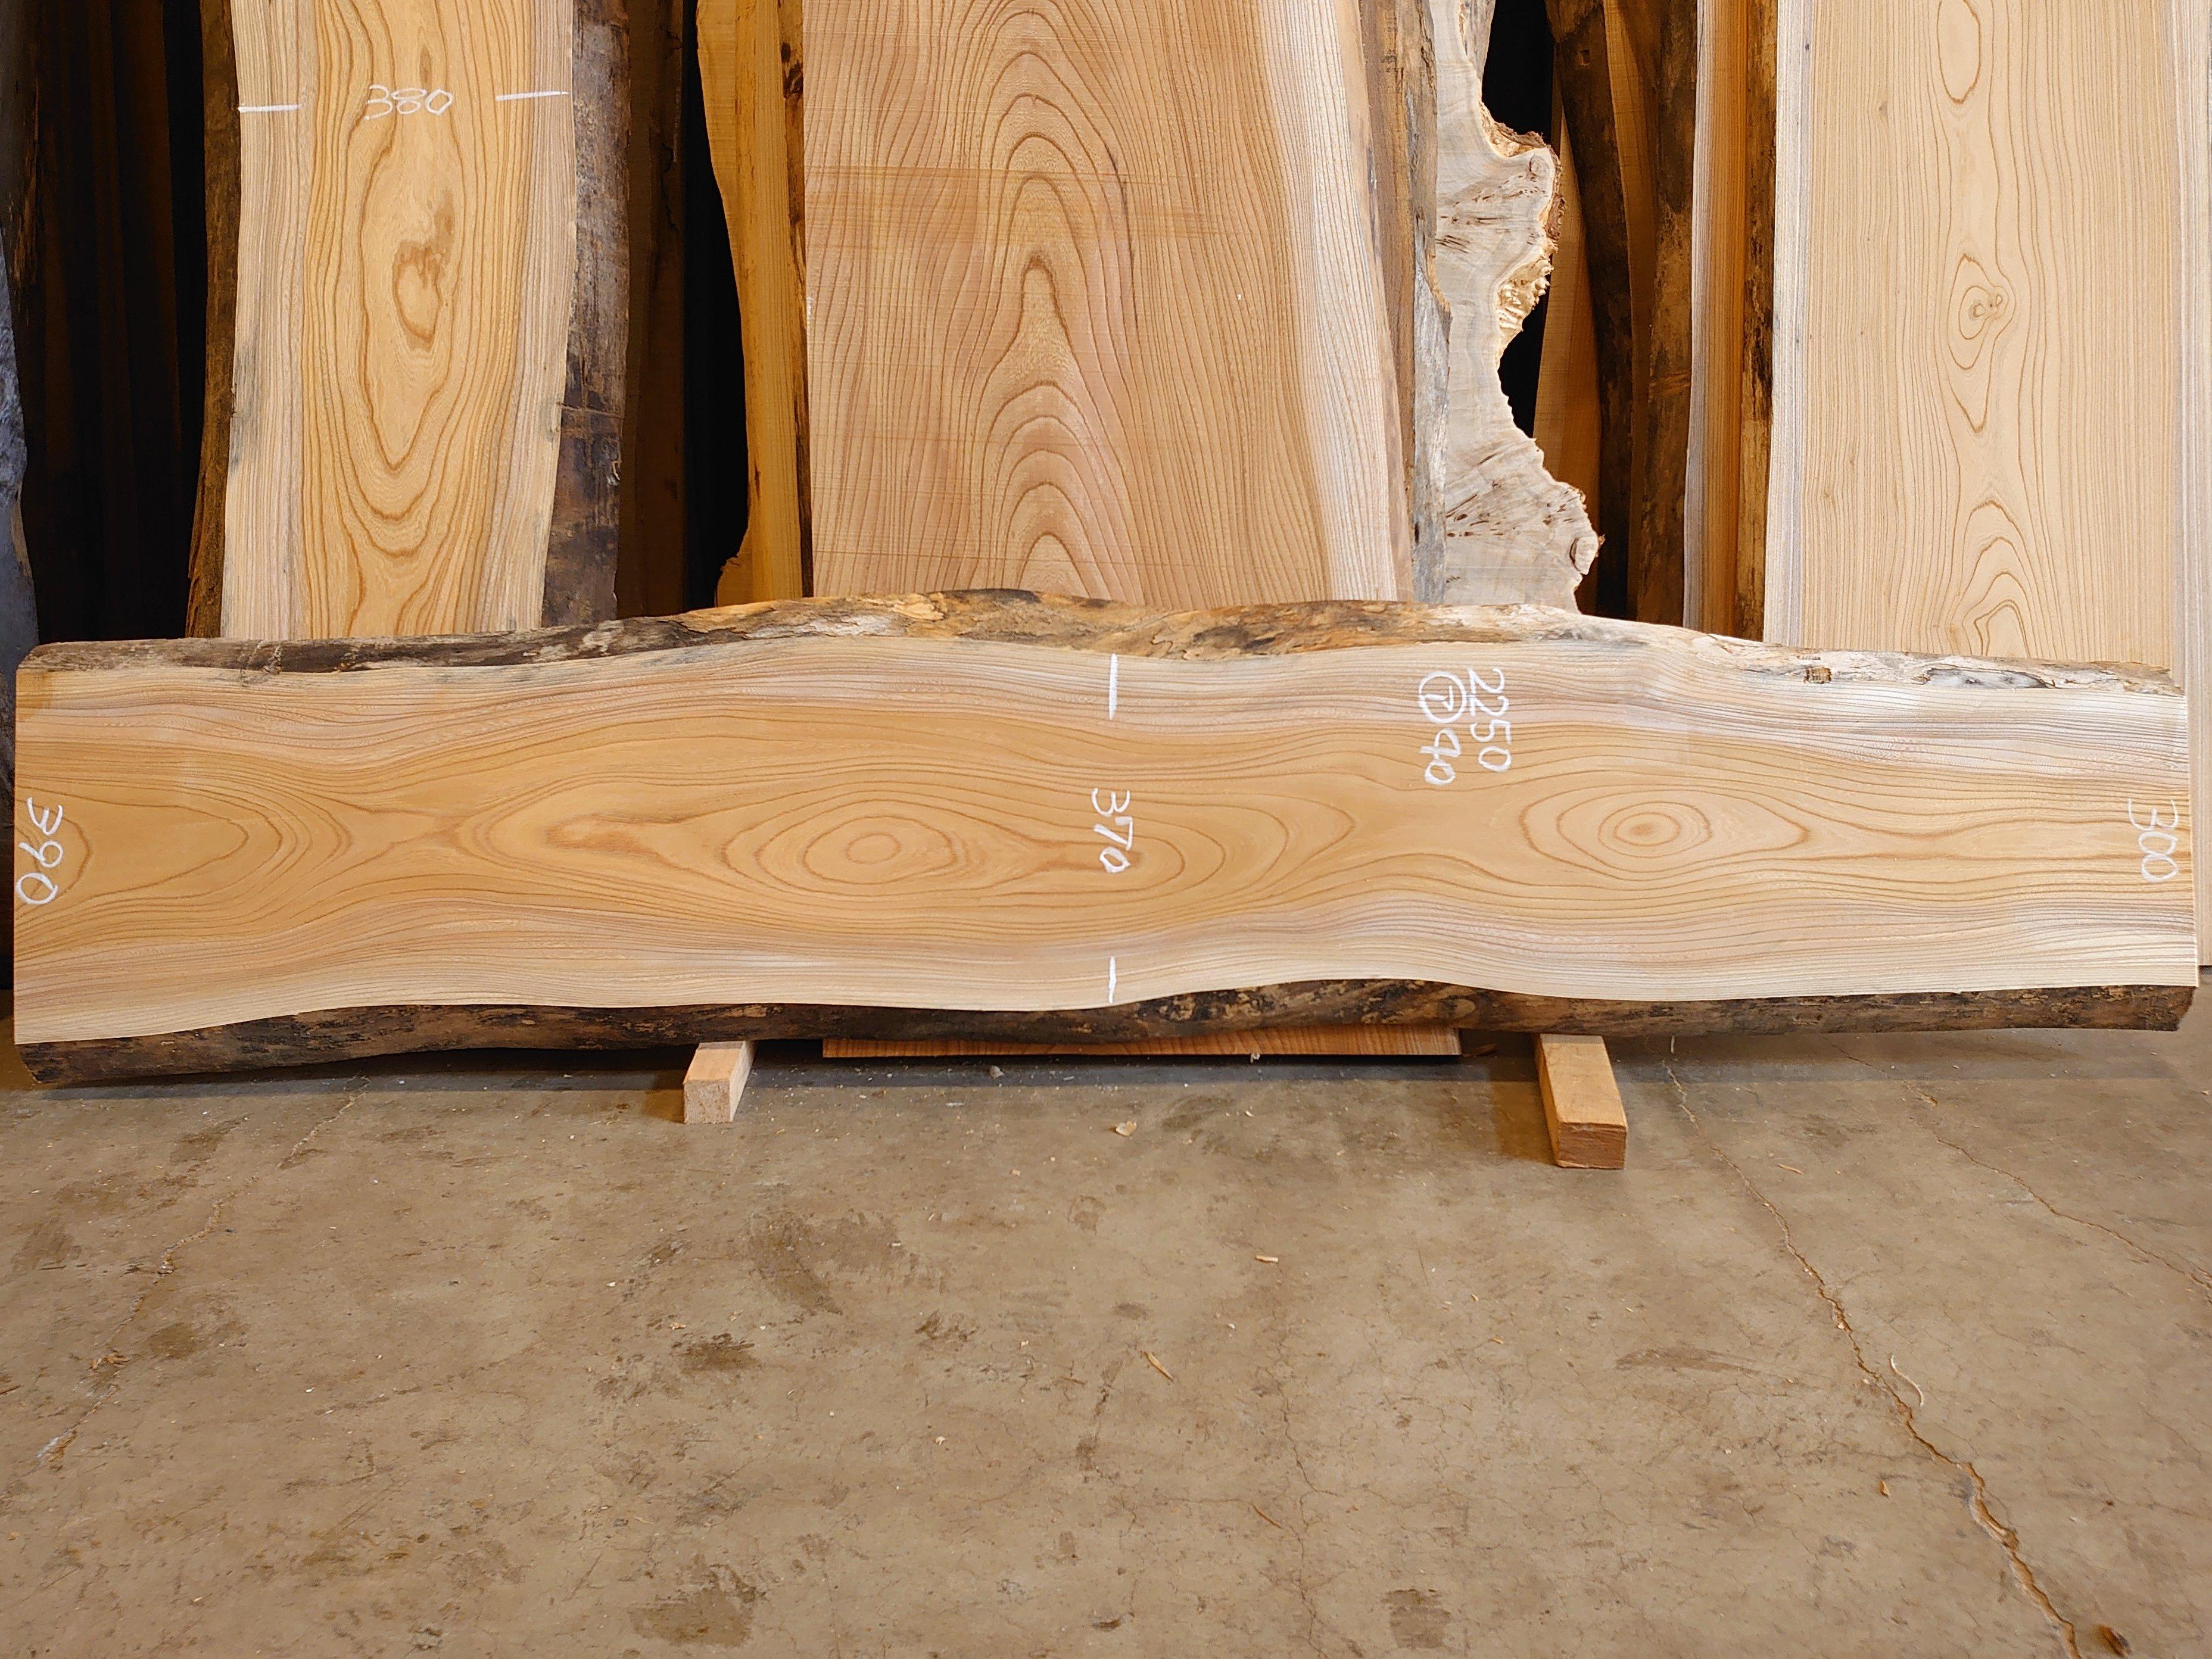 K-703 欅ケヤキ 国産 天然耳付き板 2250×450 表面電気カンナ済 天然乾燥材